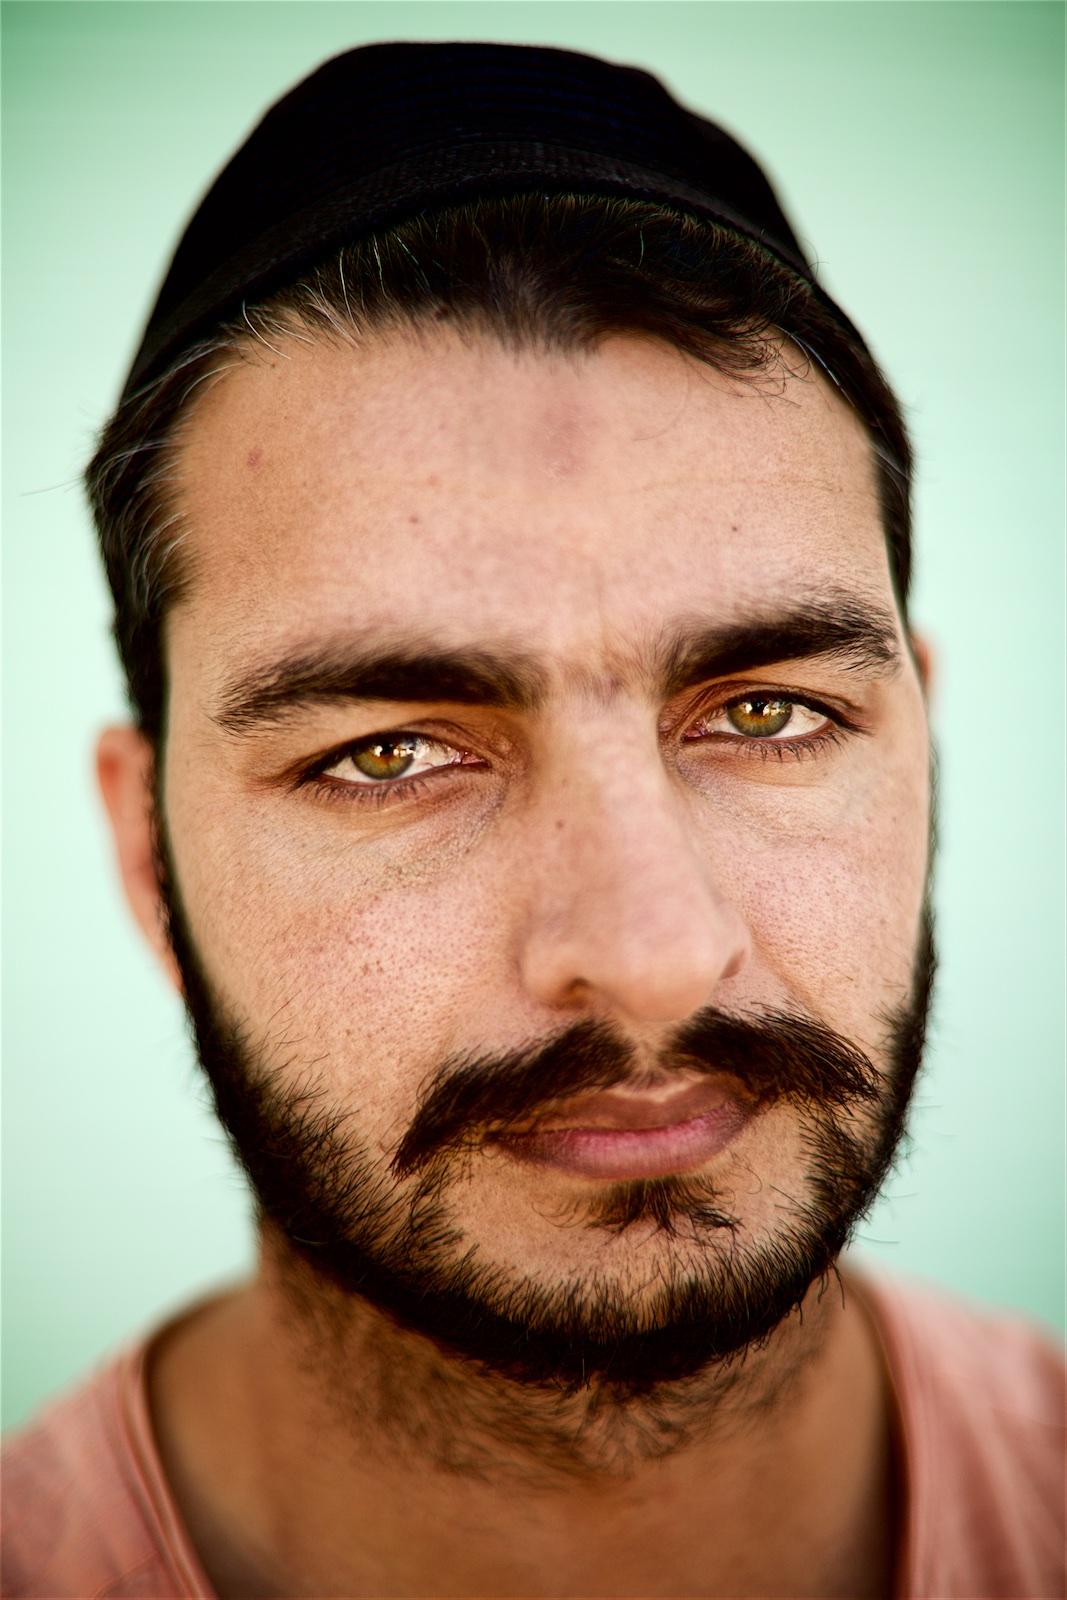 permanently-temporary-refugees-italy-rifugiati-italia-denis-bosnic-photography-portraits-4 (1).jpg